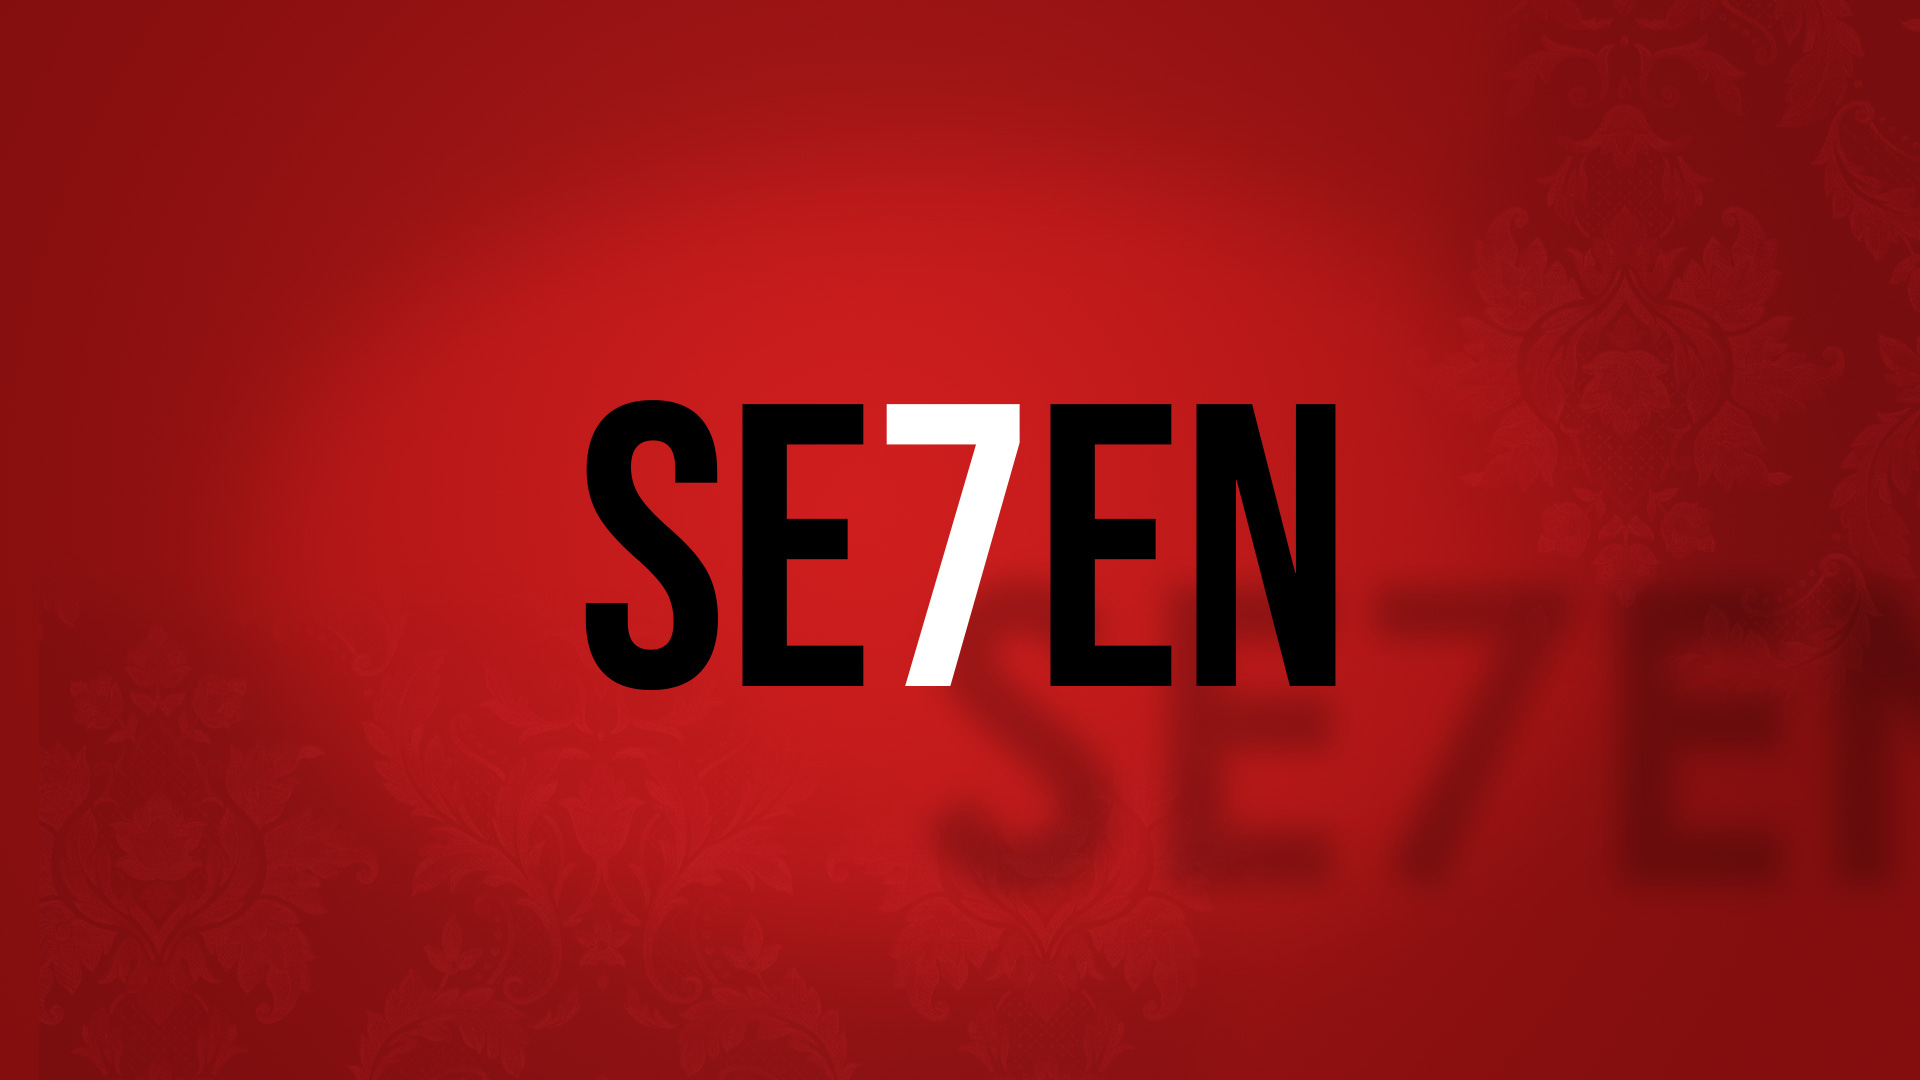 Seven Deadly Sins sermon series at Catalyst Christian Church